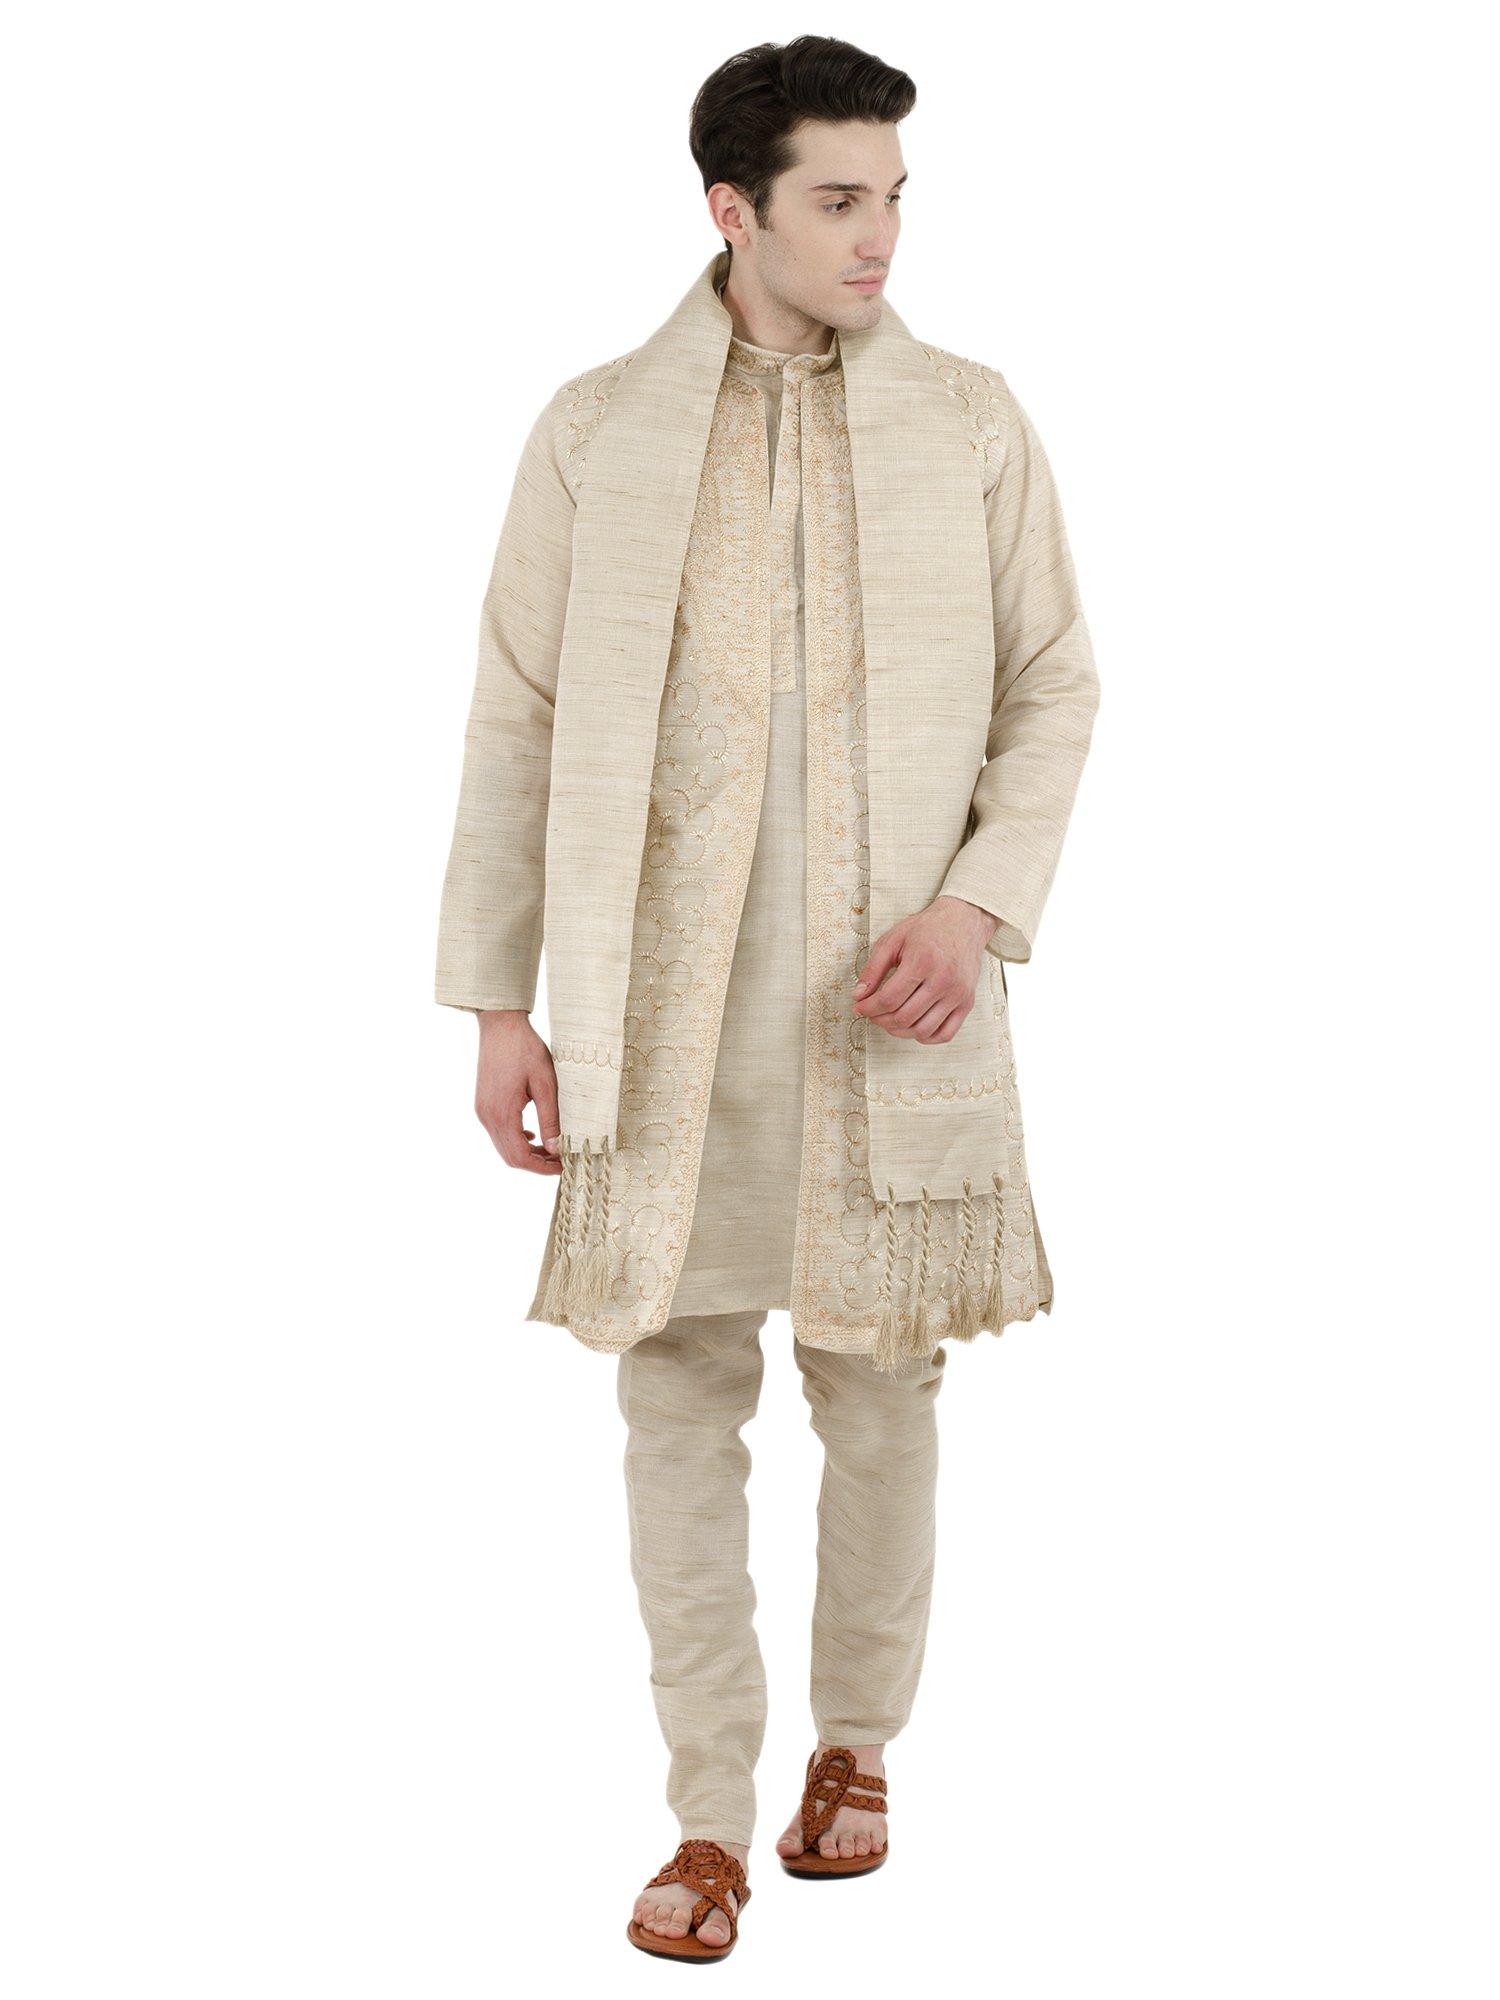 Mens Kurta Pajama Sherwani Stole 4-Pieces Set Indian Pyjama Offwhite Wedding Sherwani -S